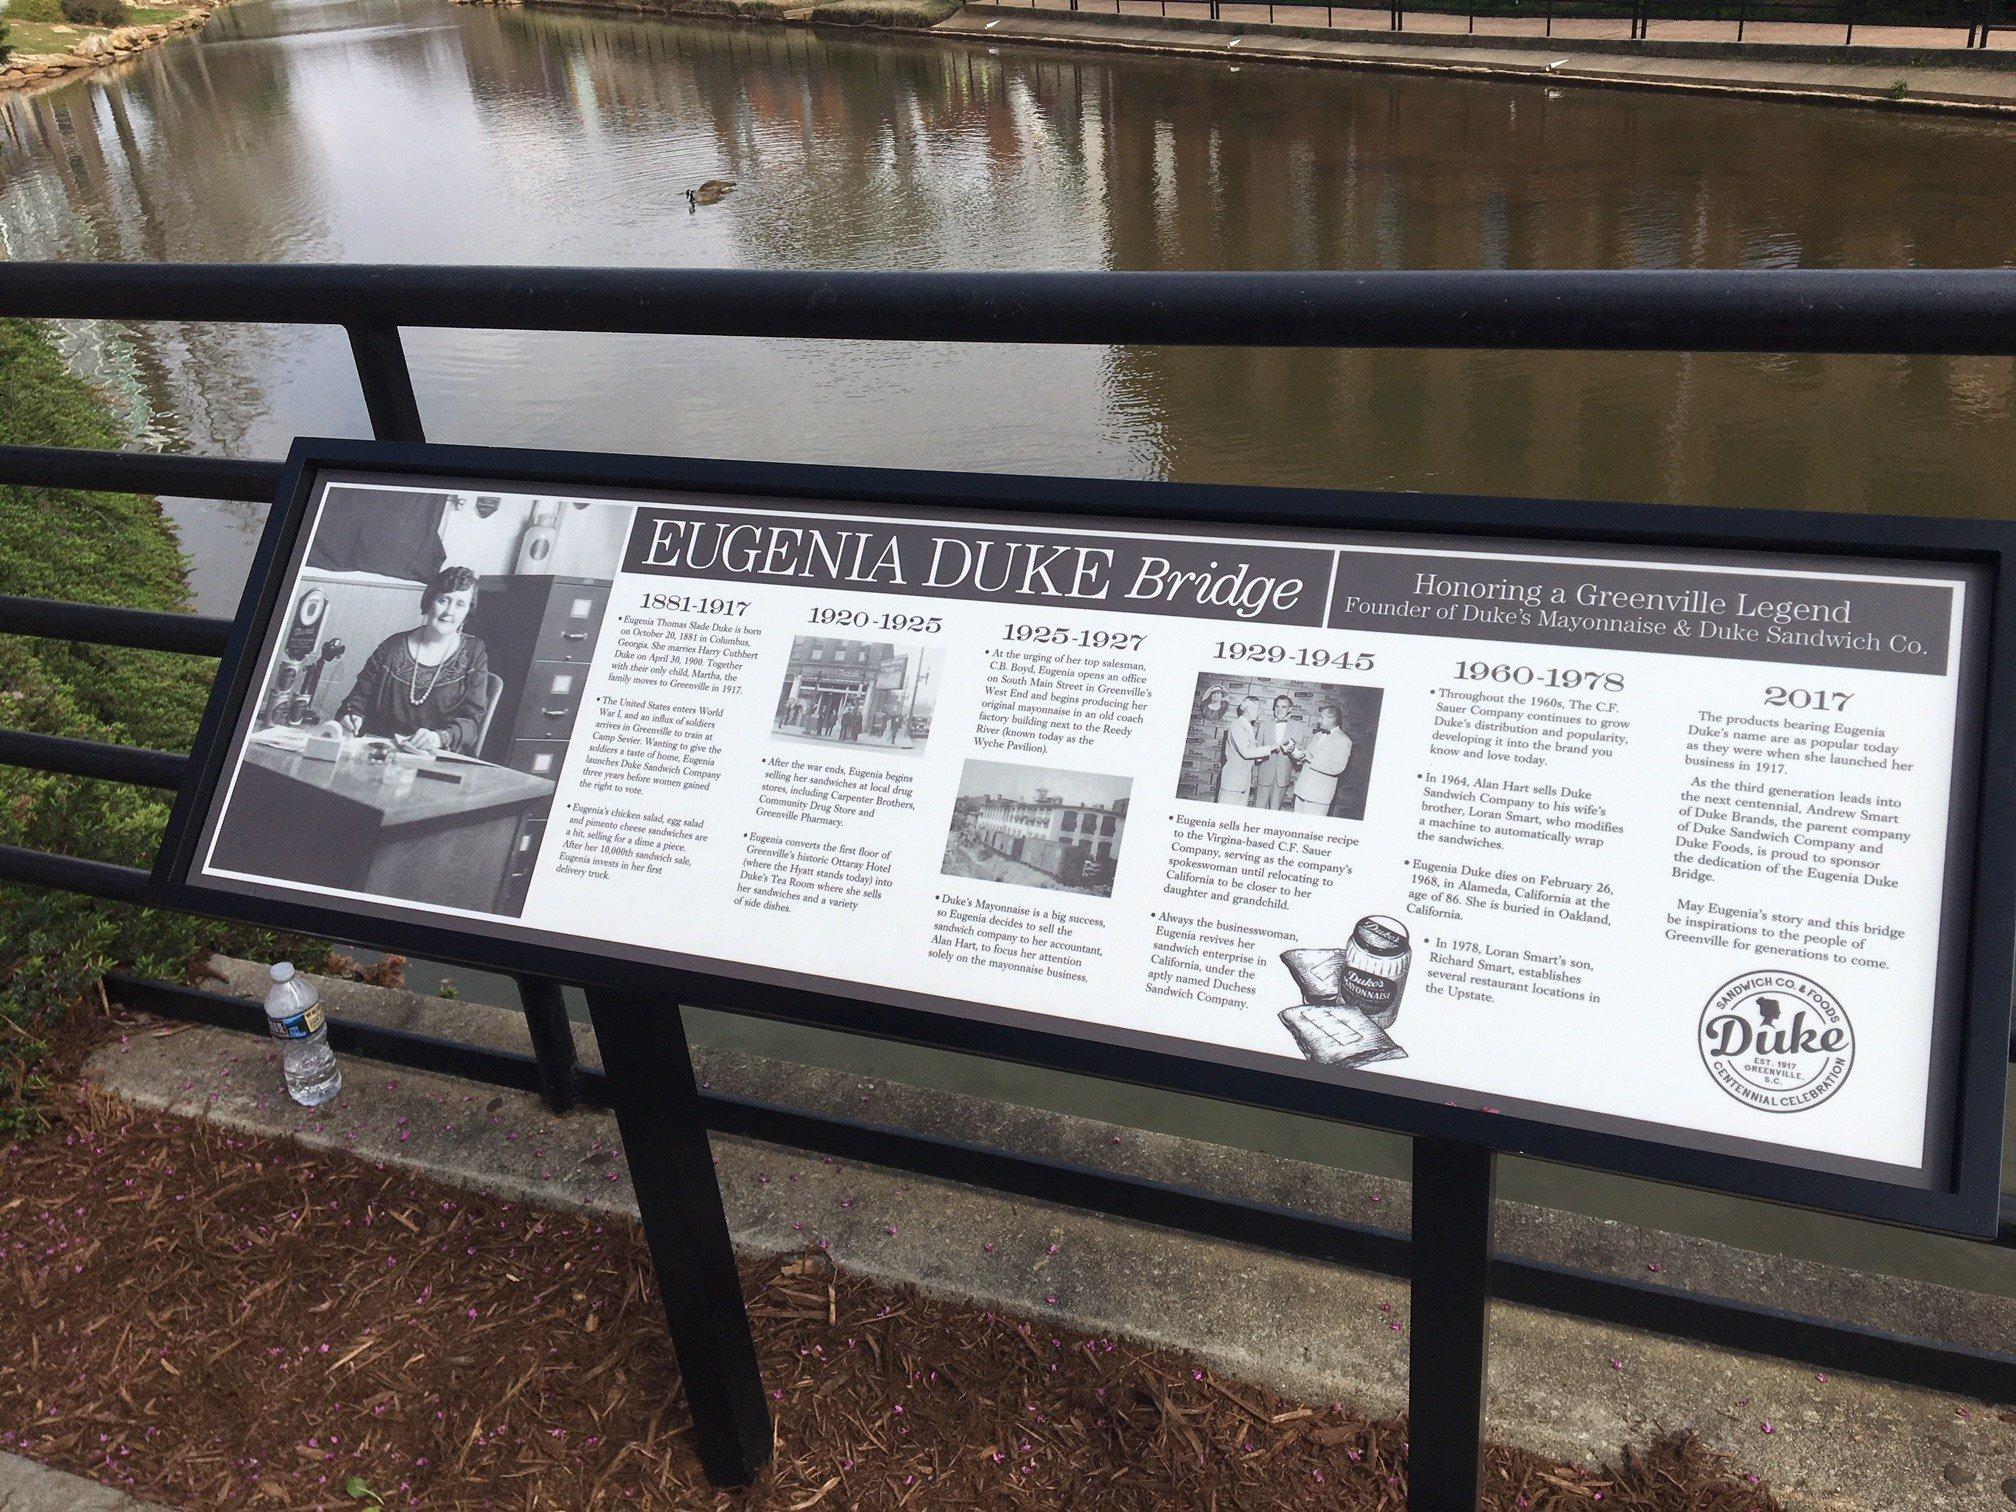 A bridge over the Reedy River in downtown Greenville was dedicated to creator of Duke's Mayonnaise, Eugenia Duke (FOX Carolina: 3/29/18).